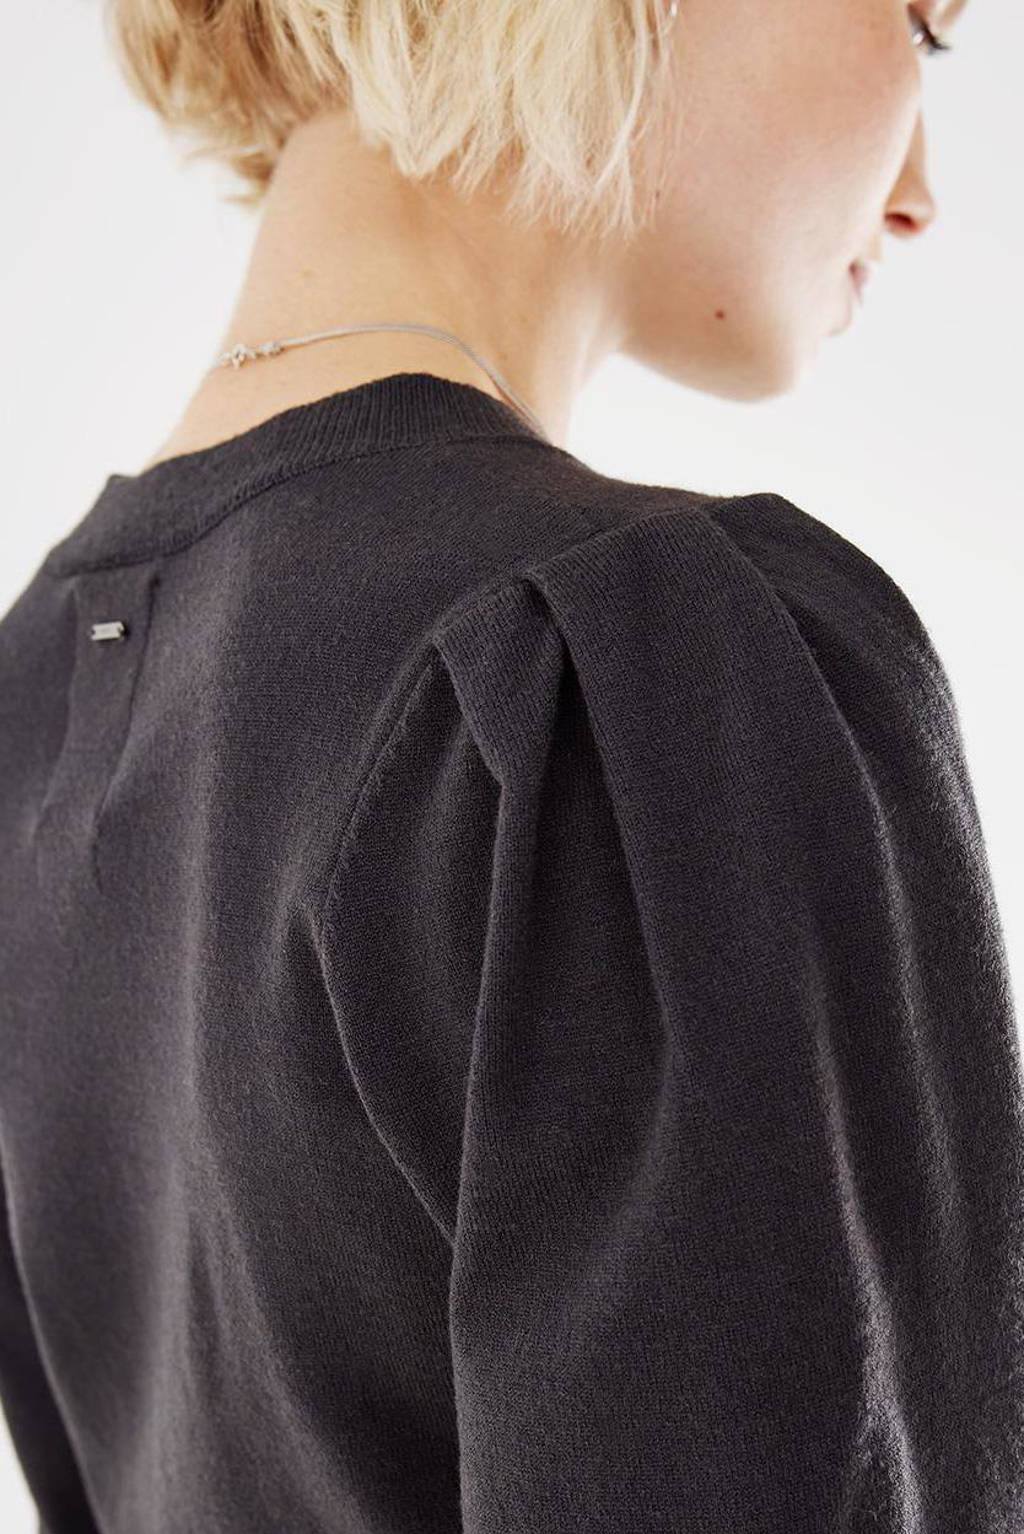 Mexx gebreide jurk zwart, Zwart